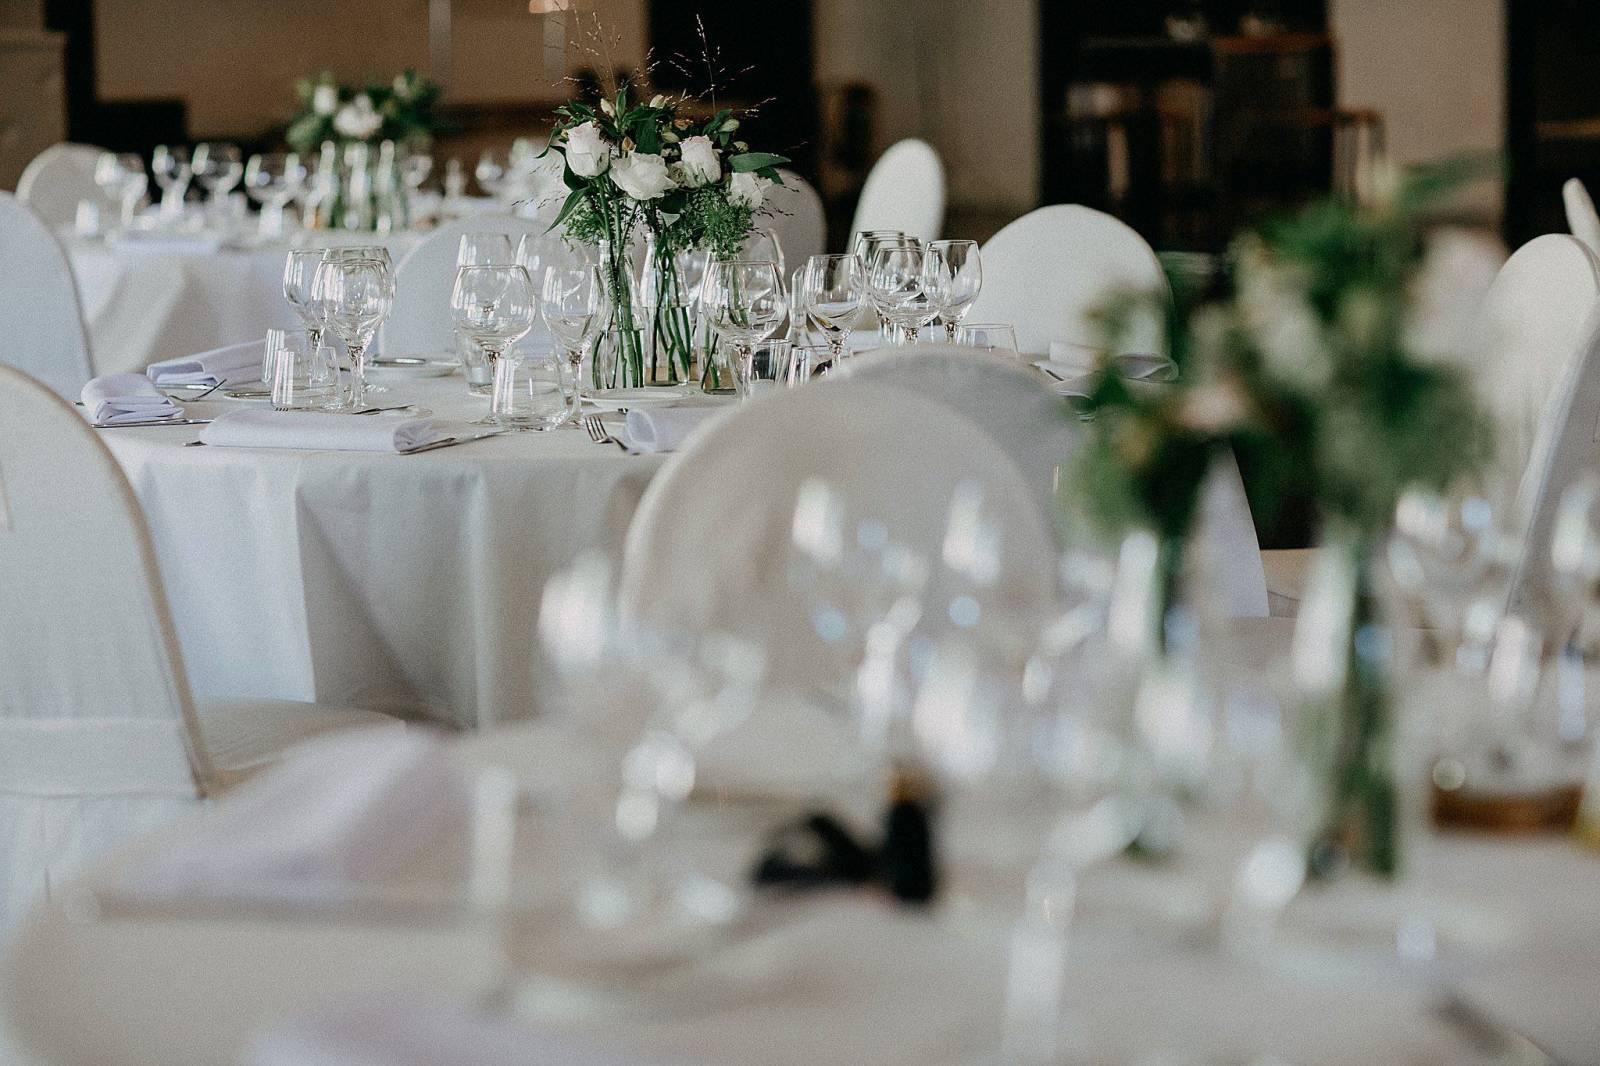 De Barrier - Feestzaal -  House of Weddings - 15